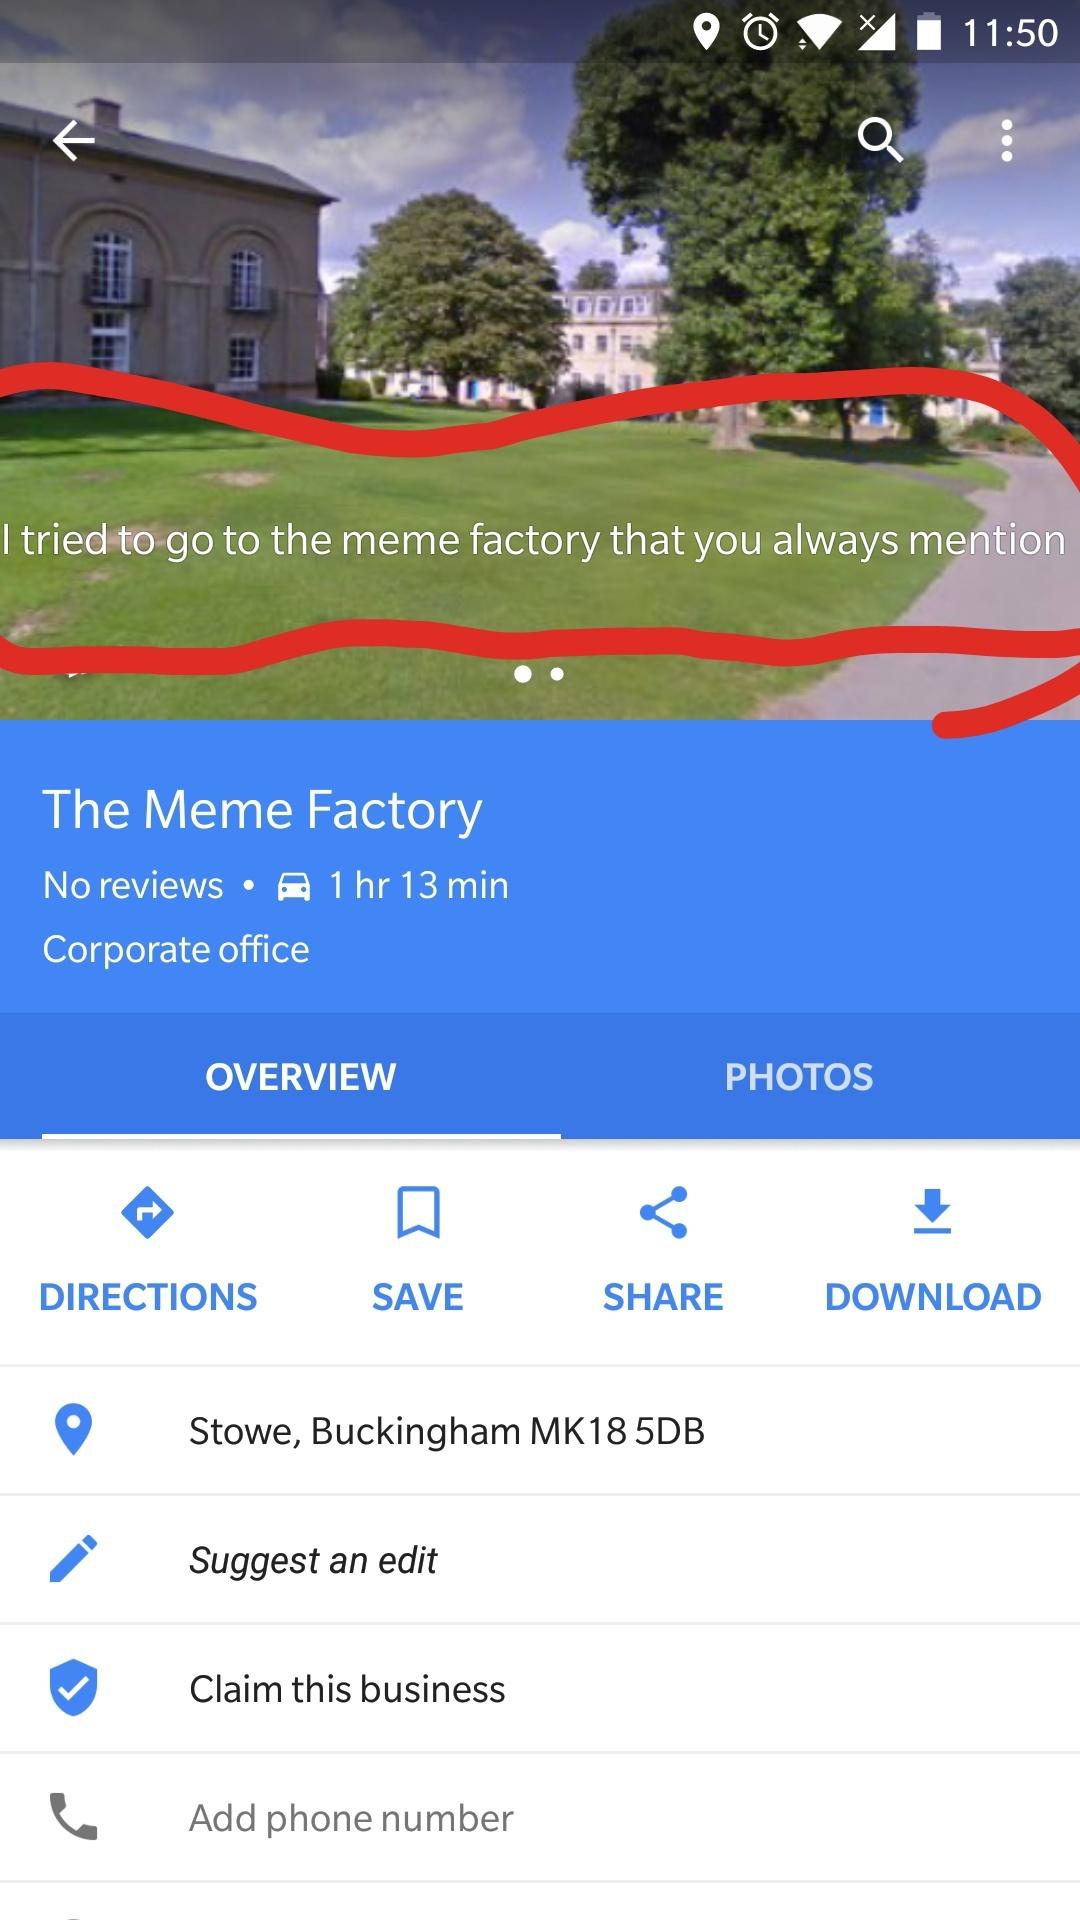 Meme factory